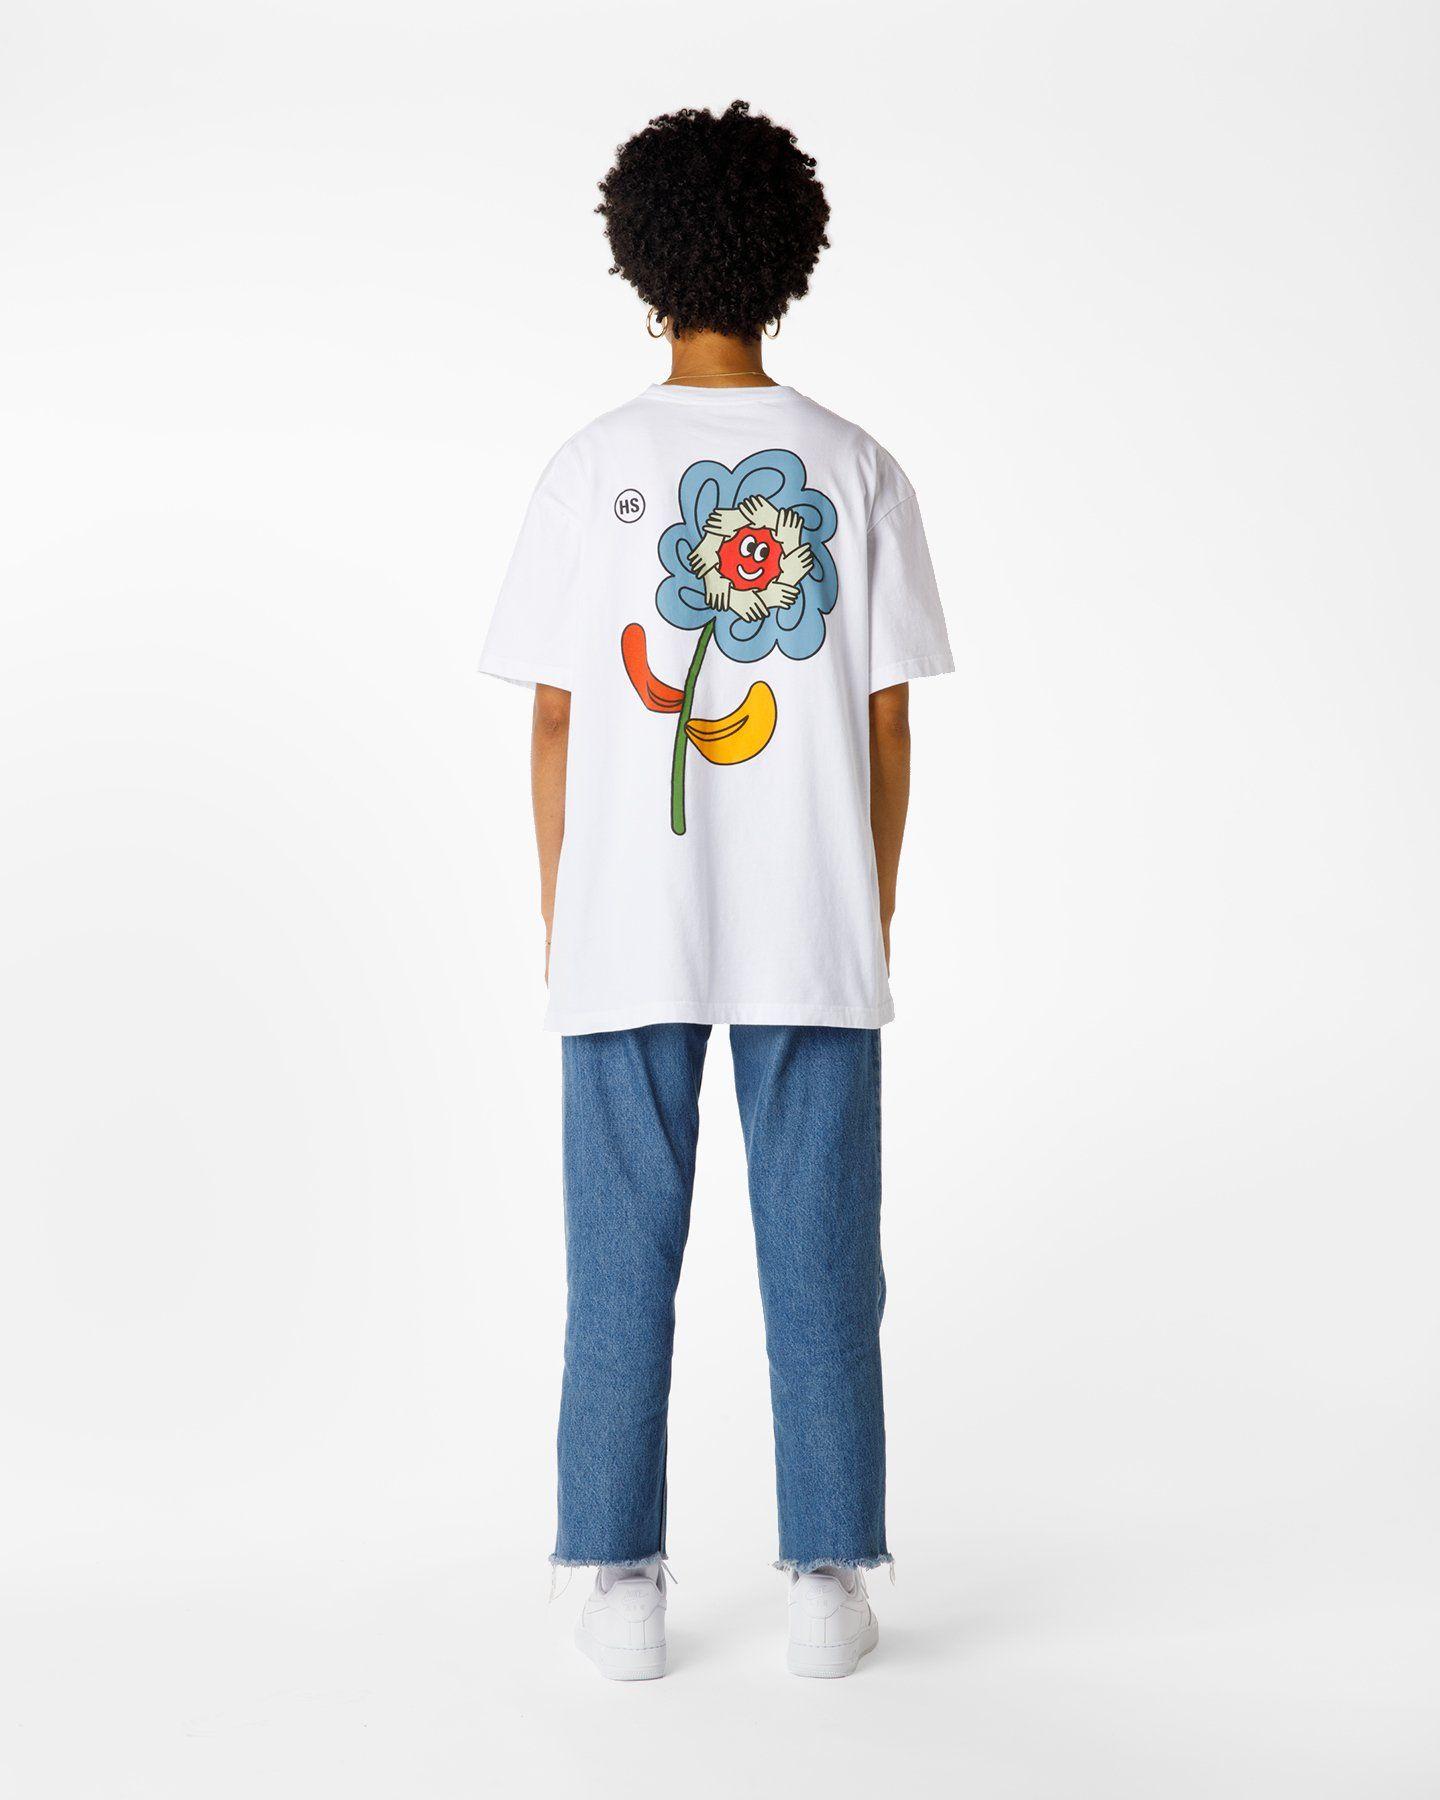 Highsnobiety in Good Company T-Shirt - Image 5